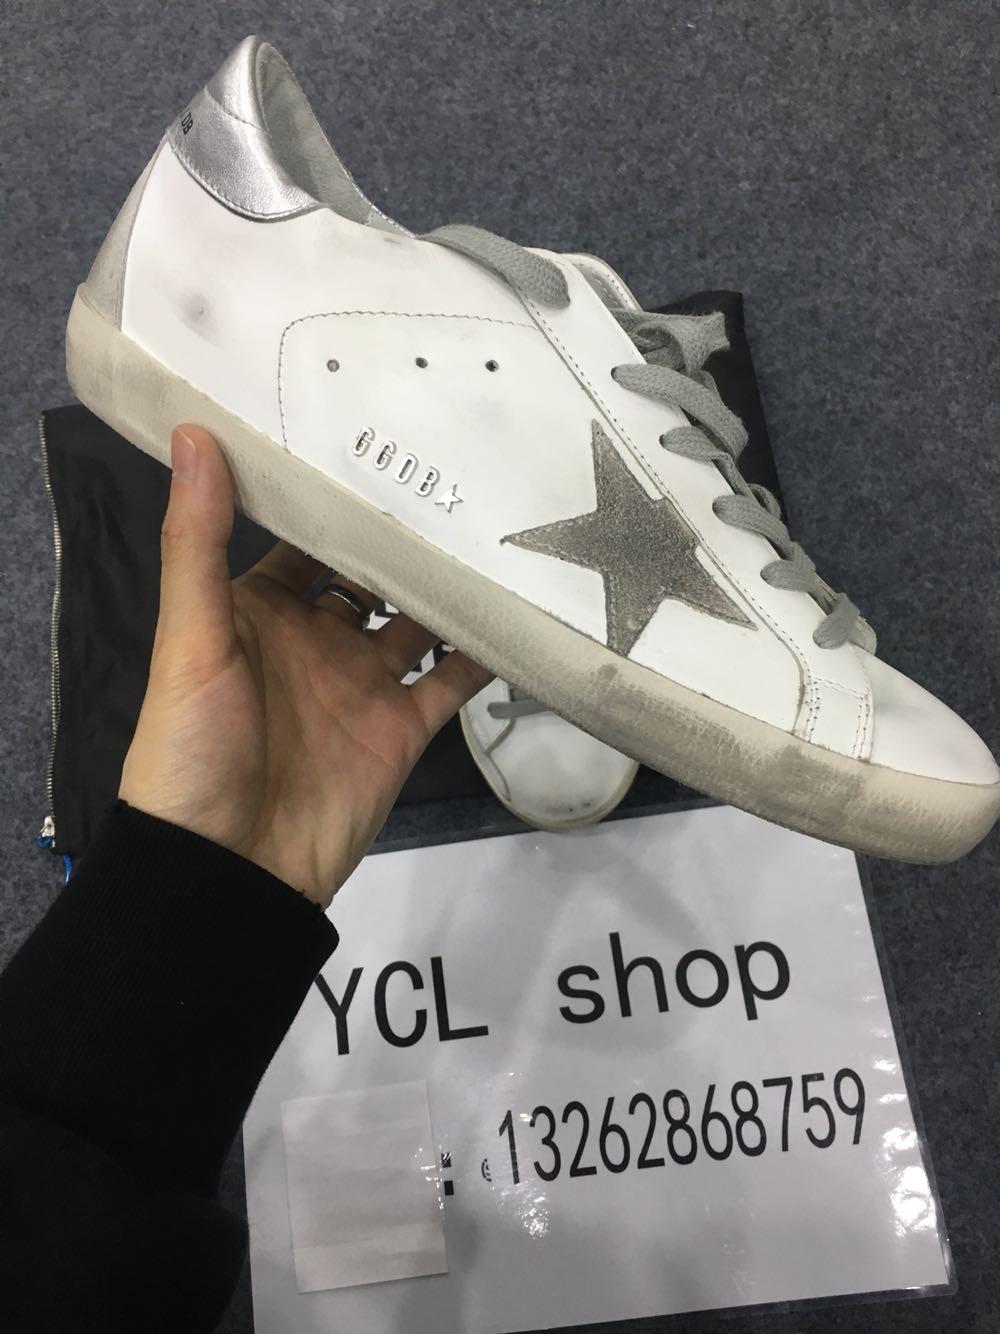 【YCL】Golden Goose GGDB 银尾低帮小脏鞋休闲鞋